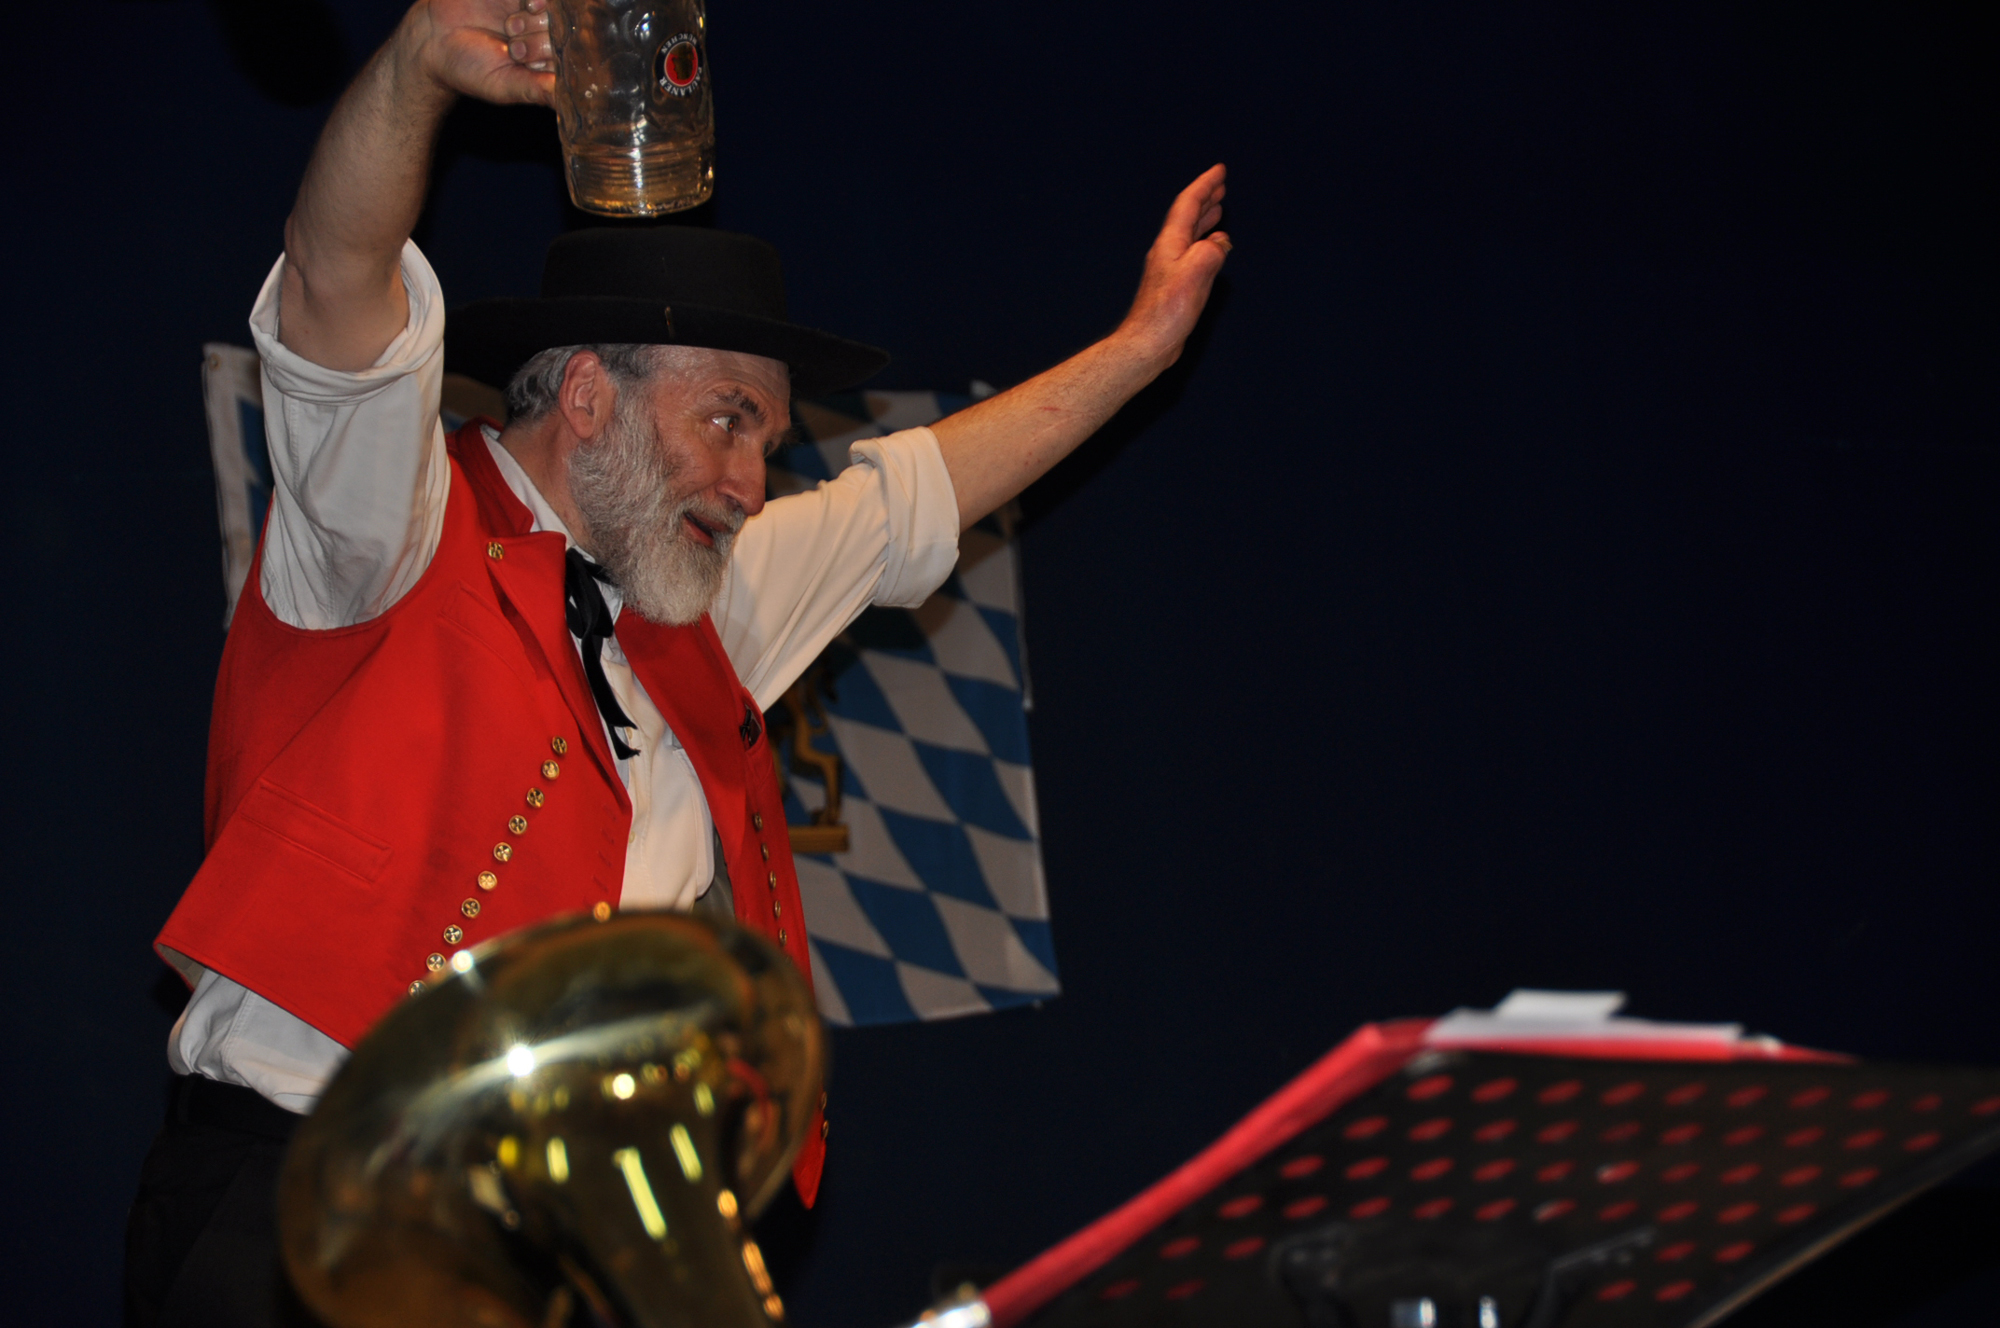 LA-CRAU-2011-Orchestre-alsacien-20